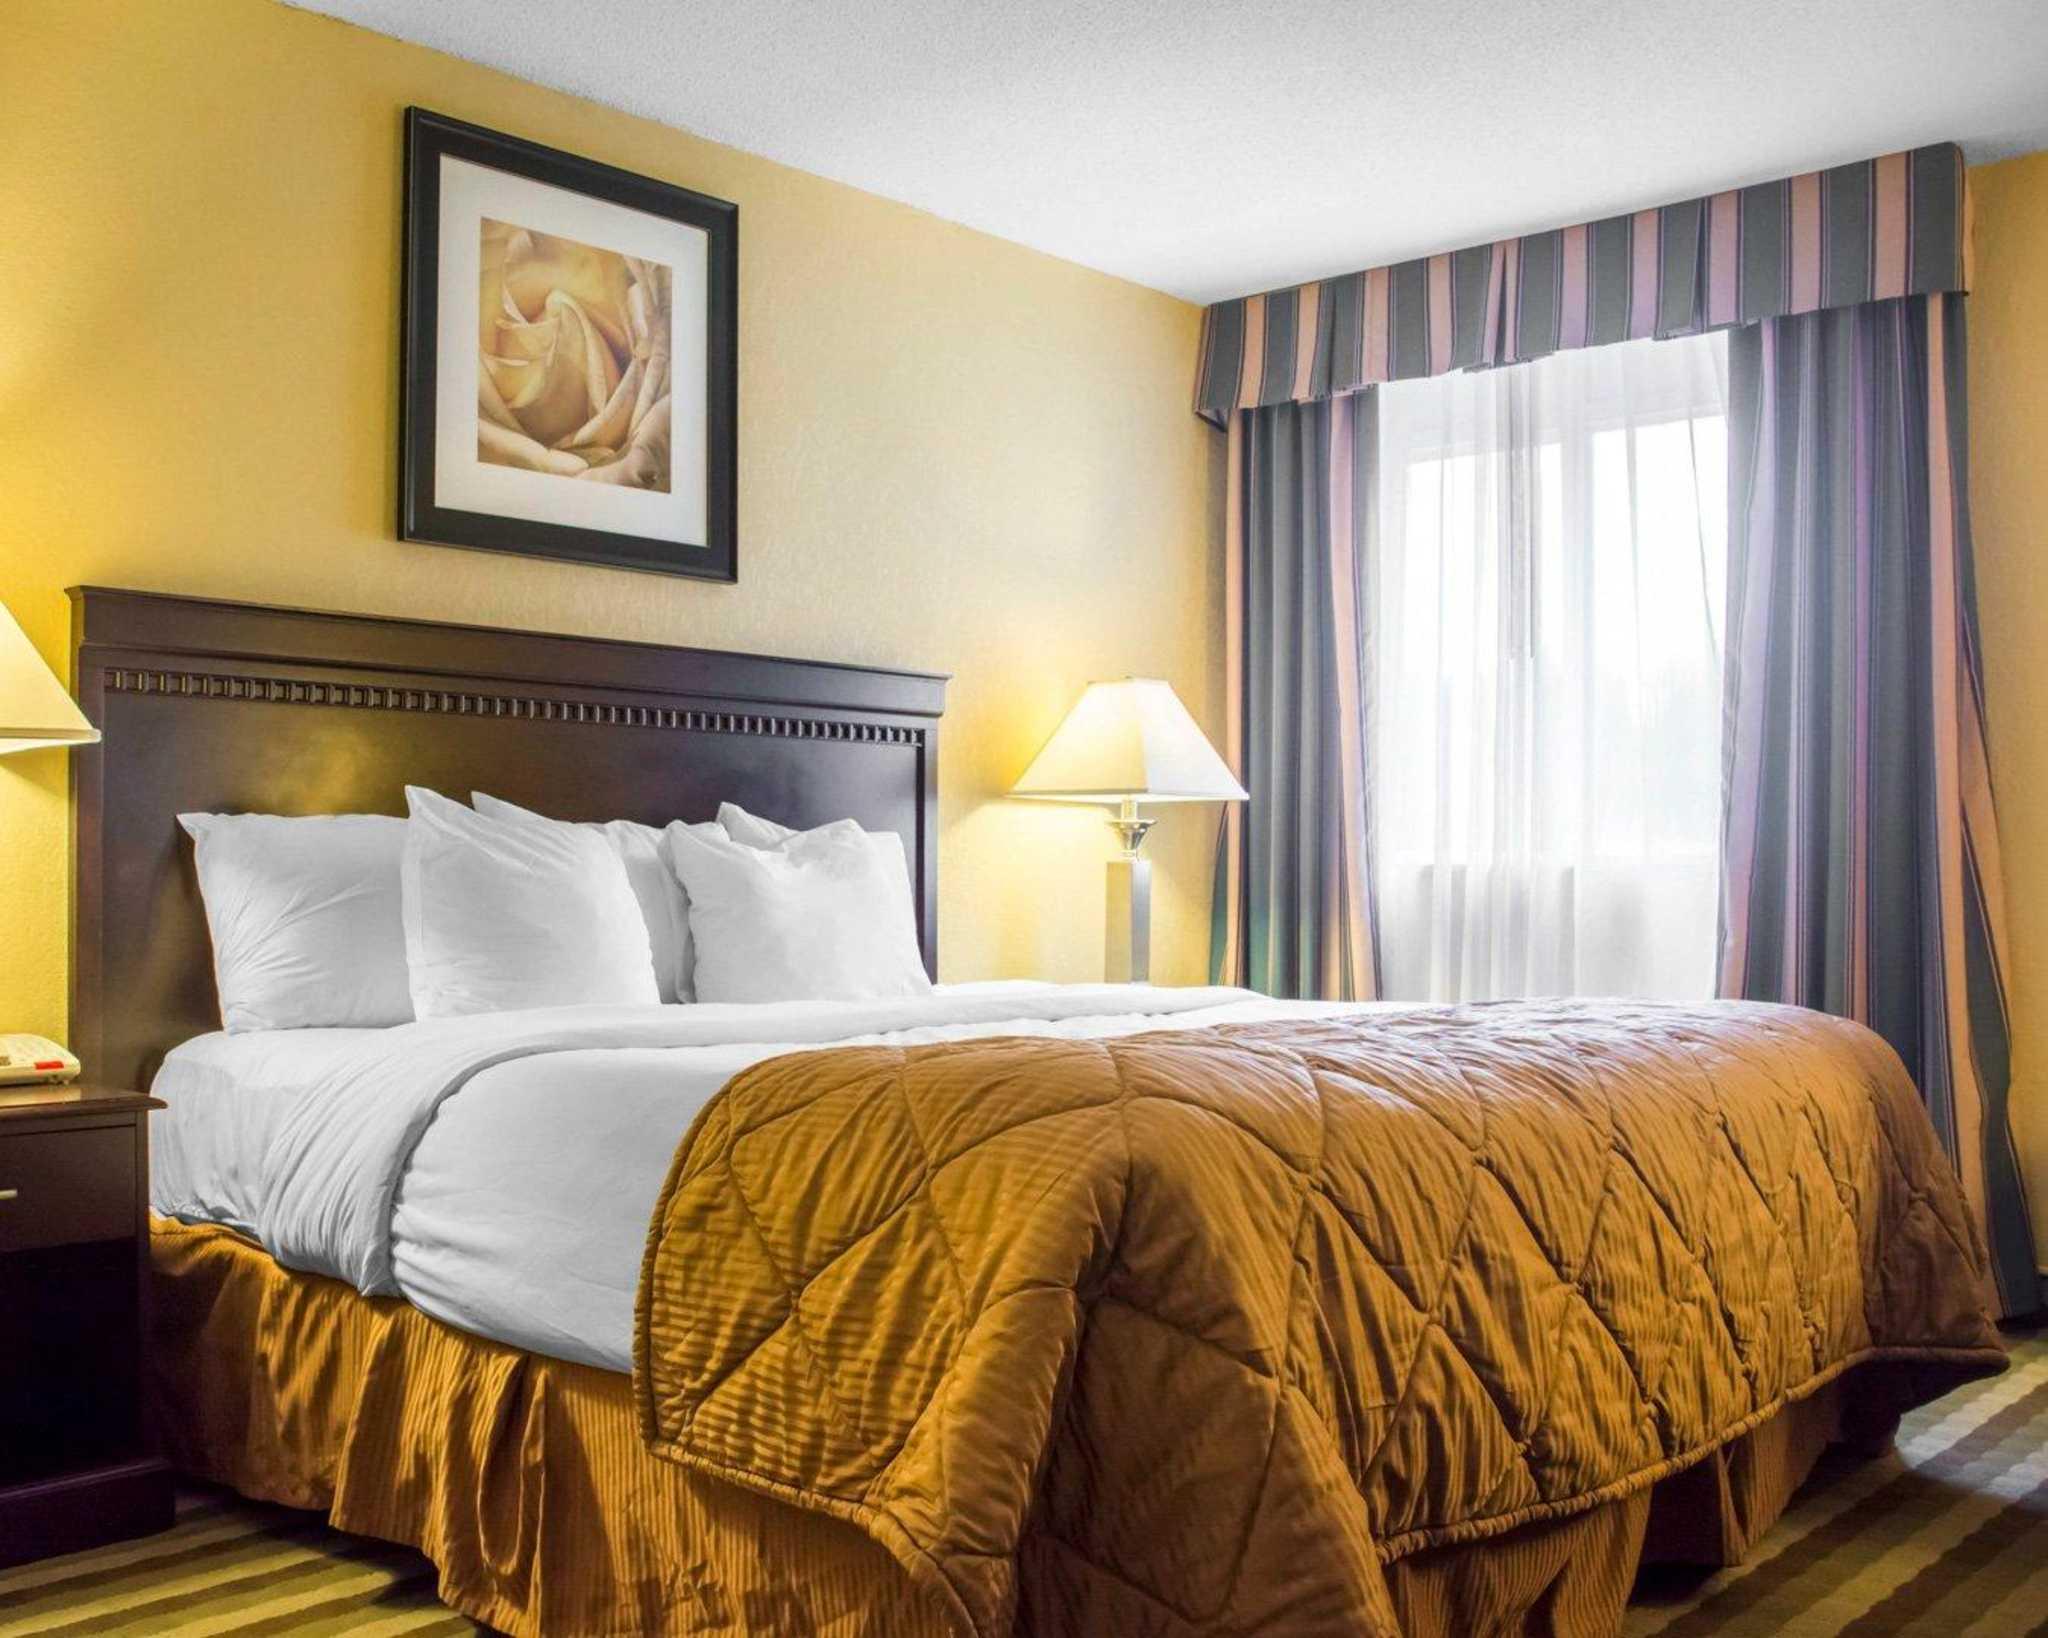 Quality Inn & Suites Fairgrounds image 3